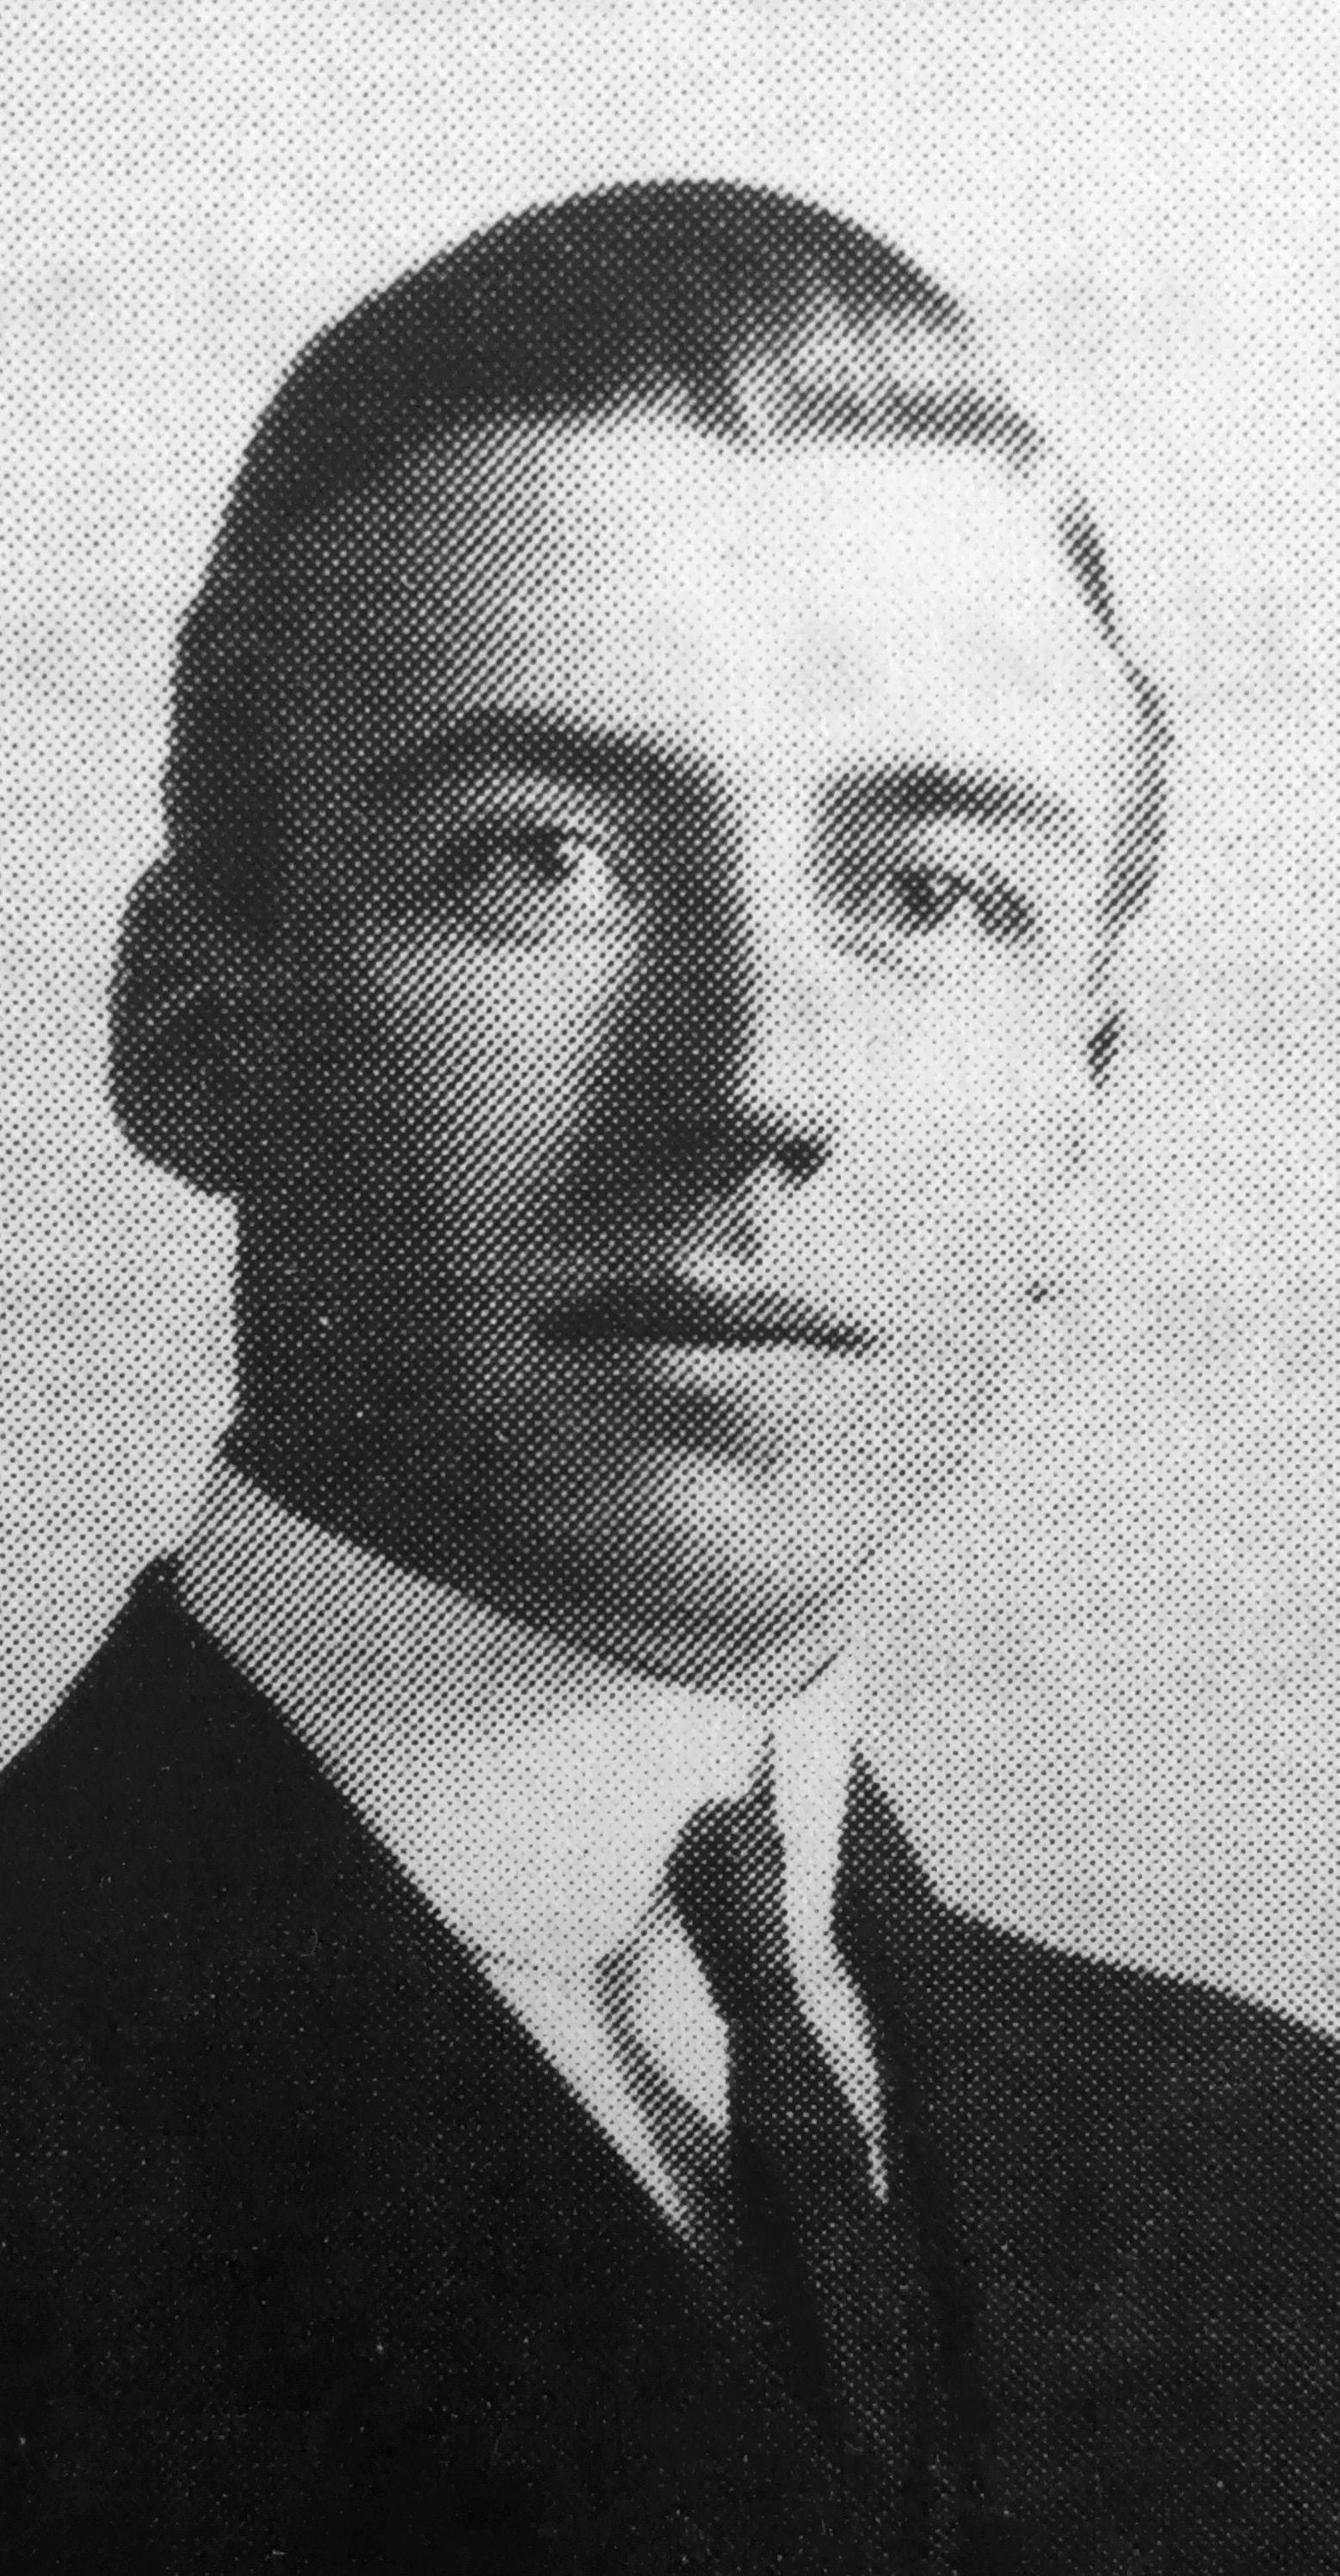 Auger, William Henry